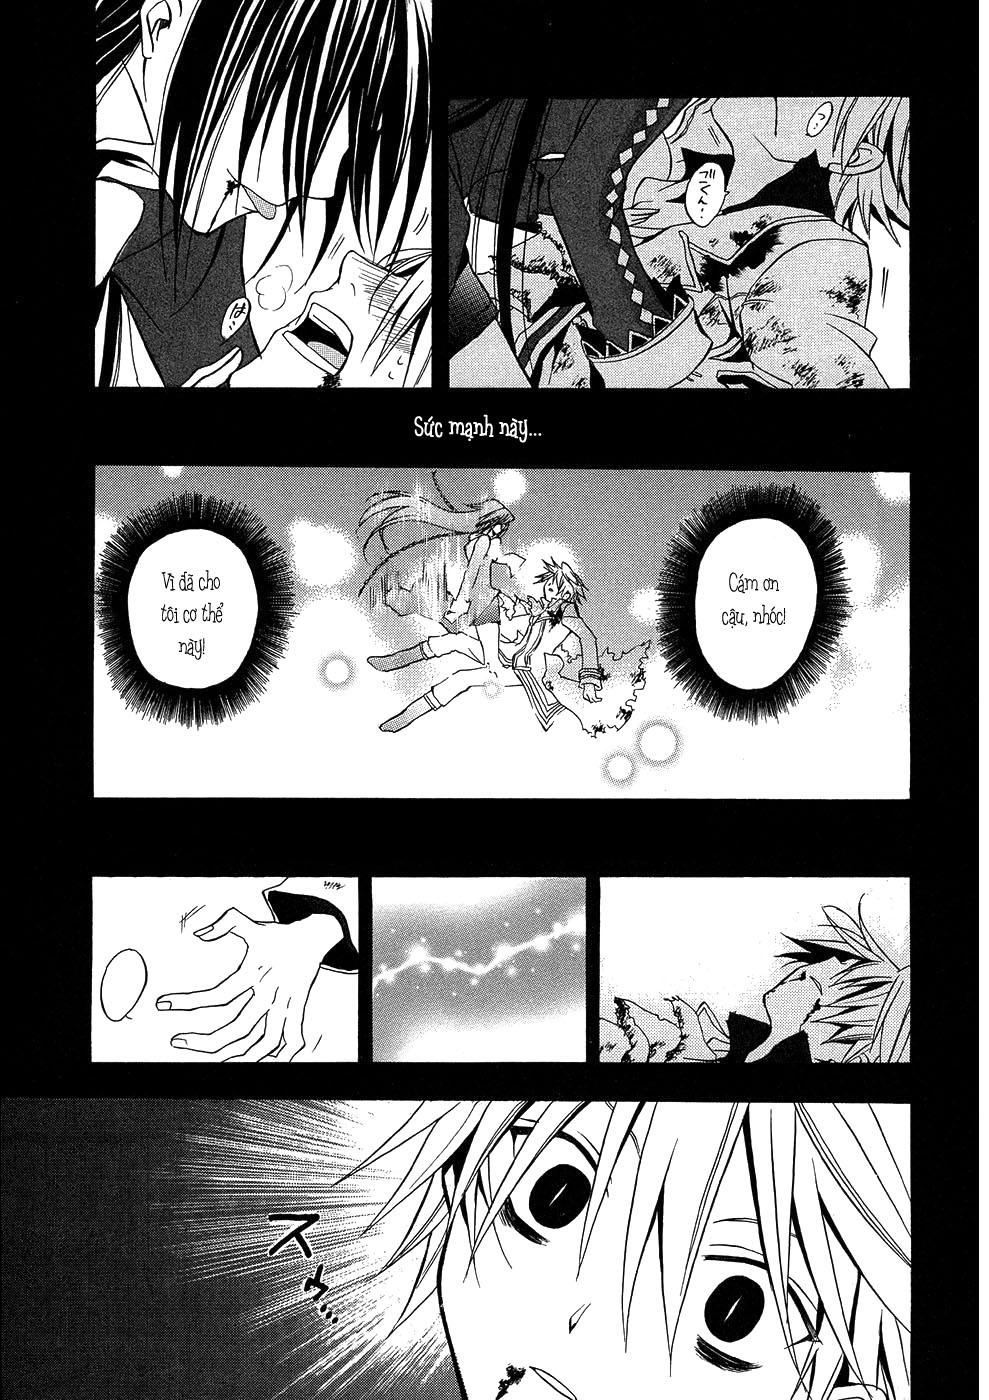 Pandora Hearts chương 003 - retrace: iii prisoner & alichino trang 36